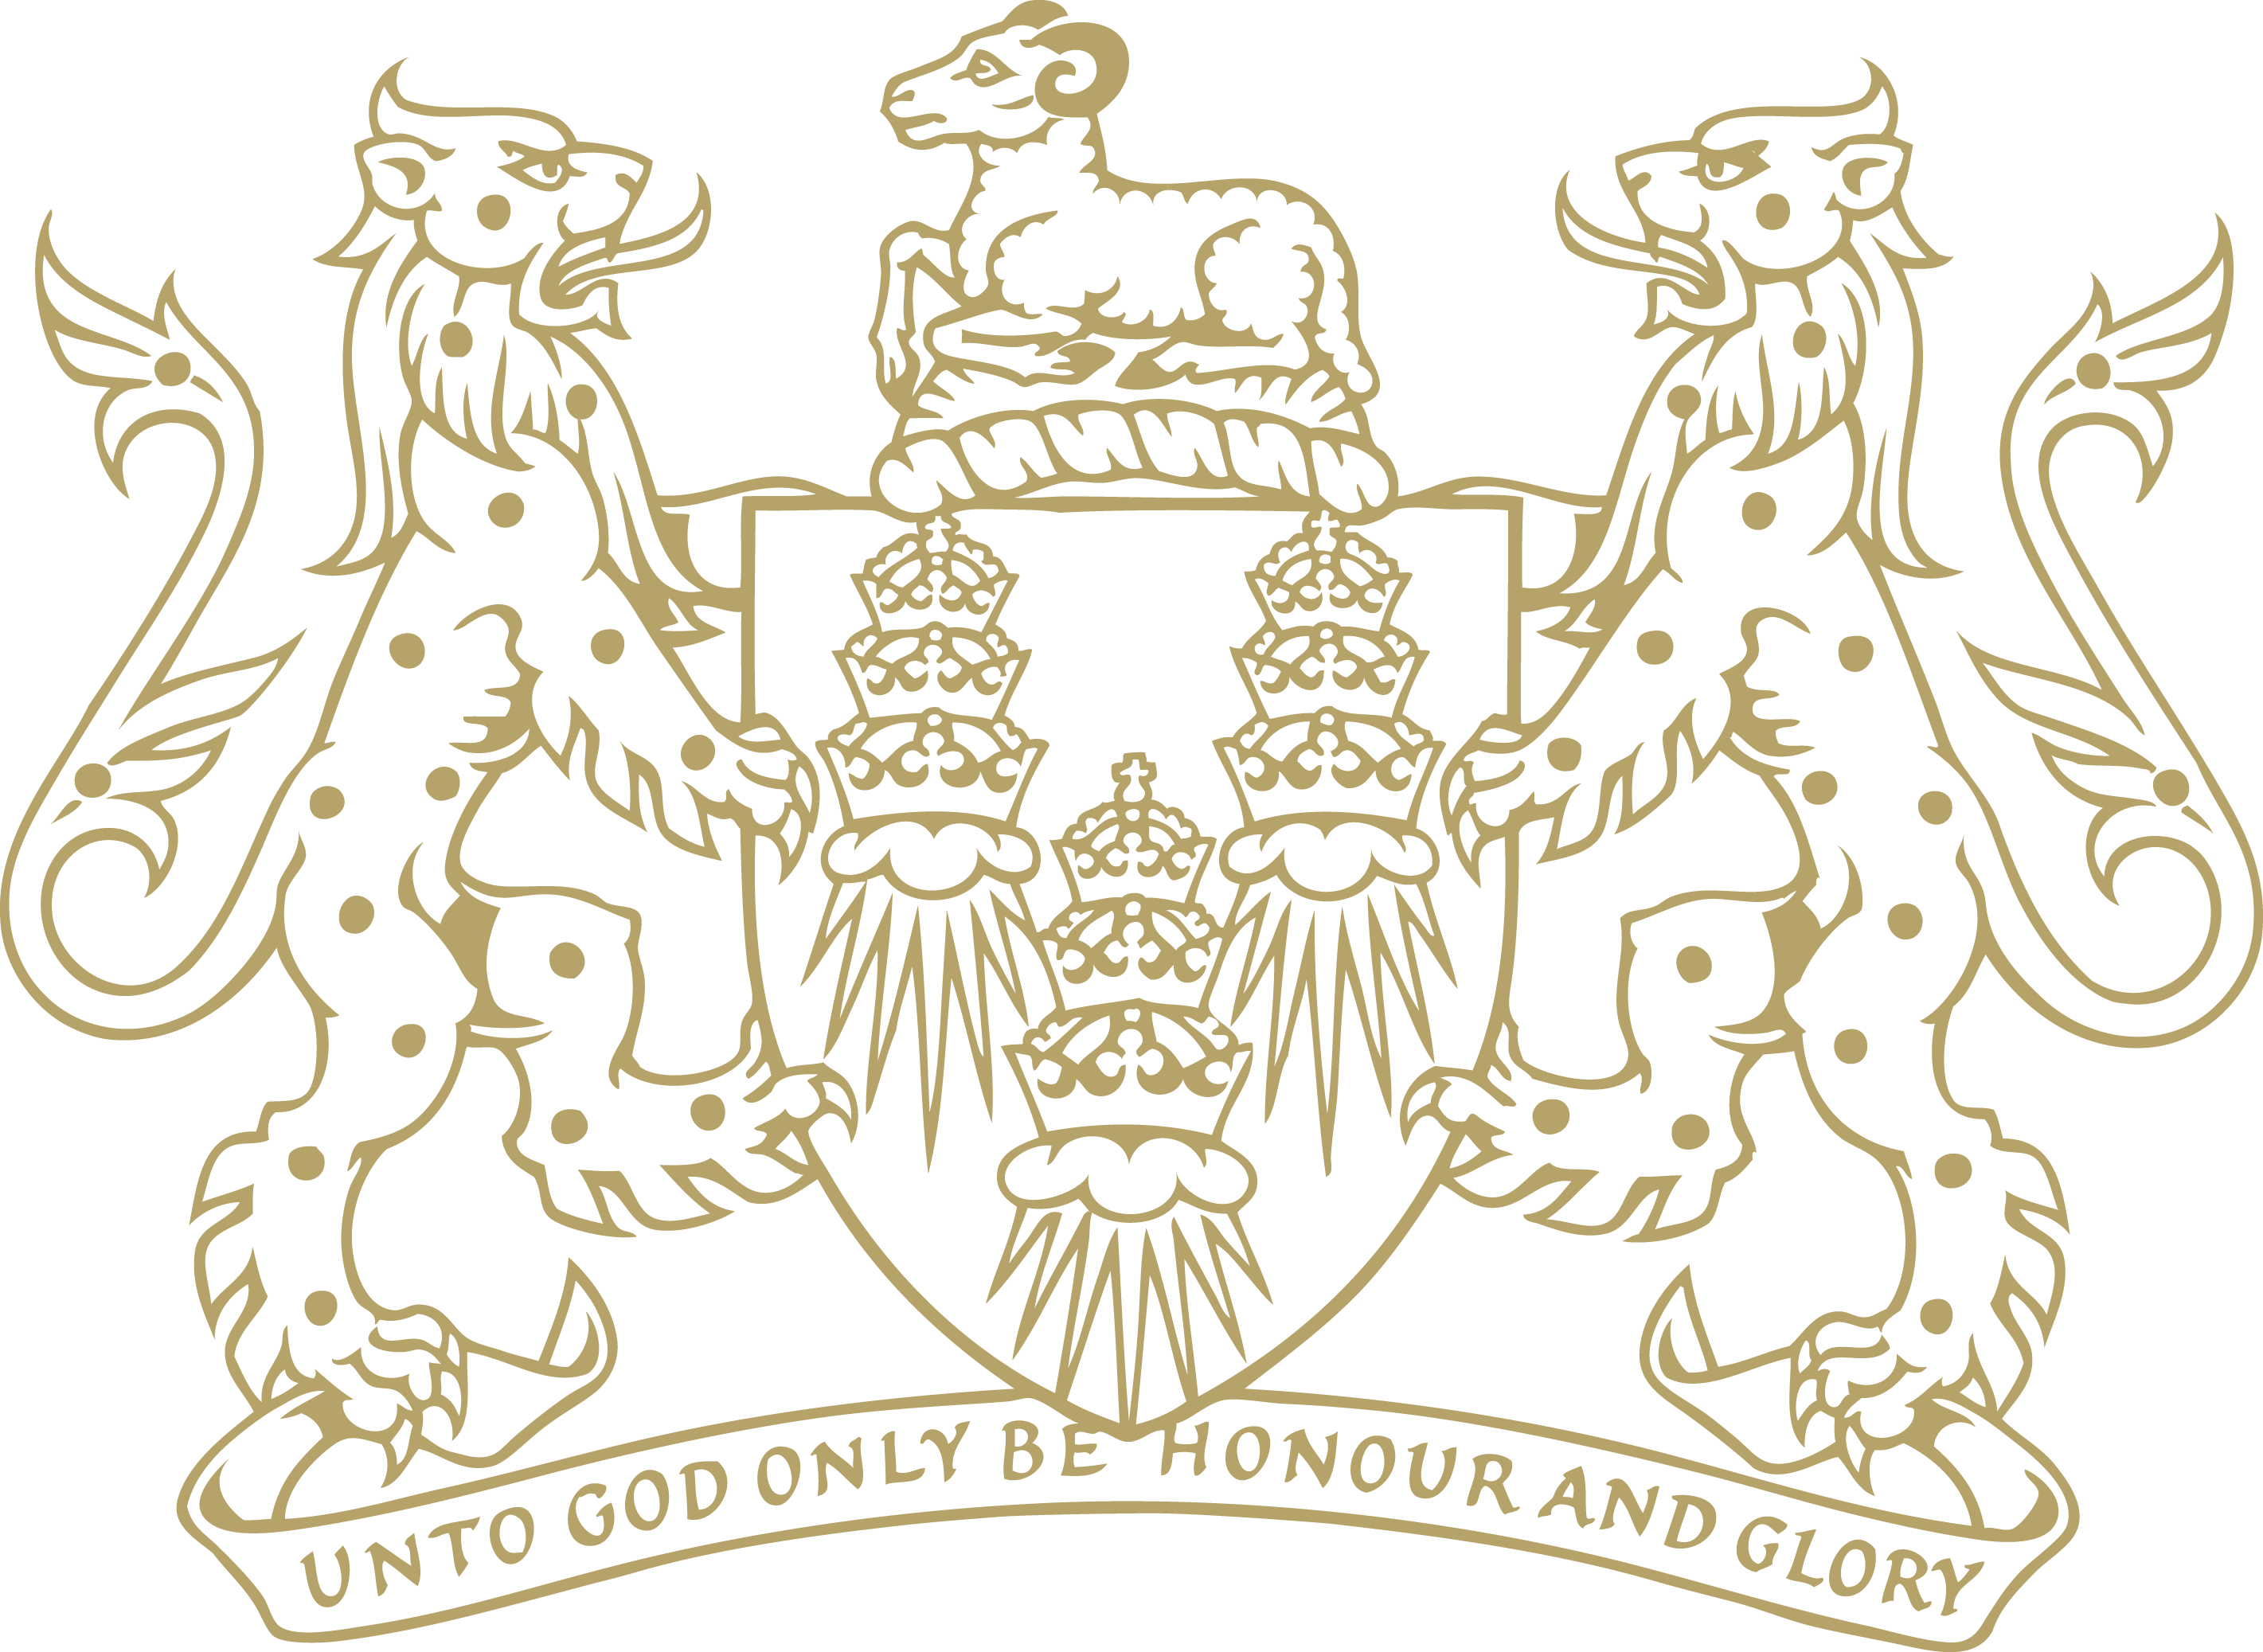 Bancroft School Crest